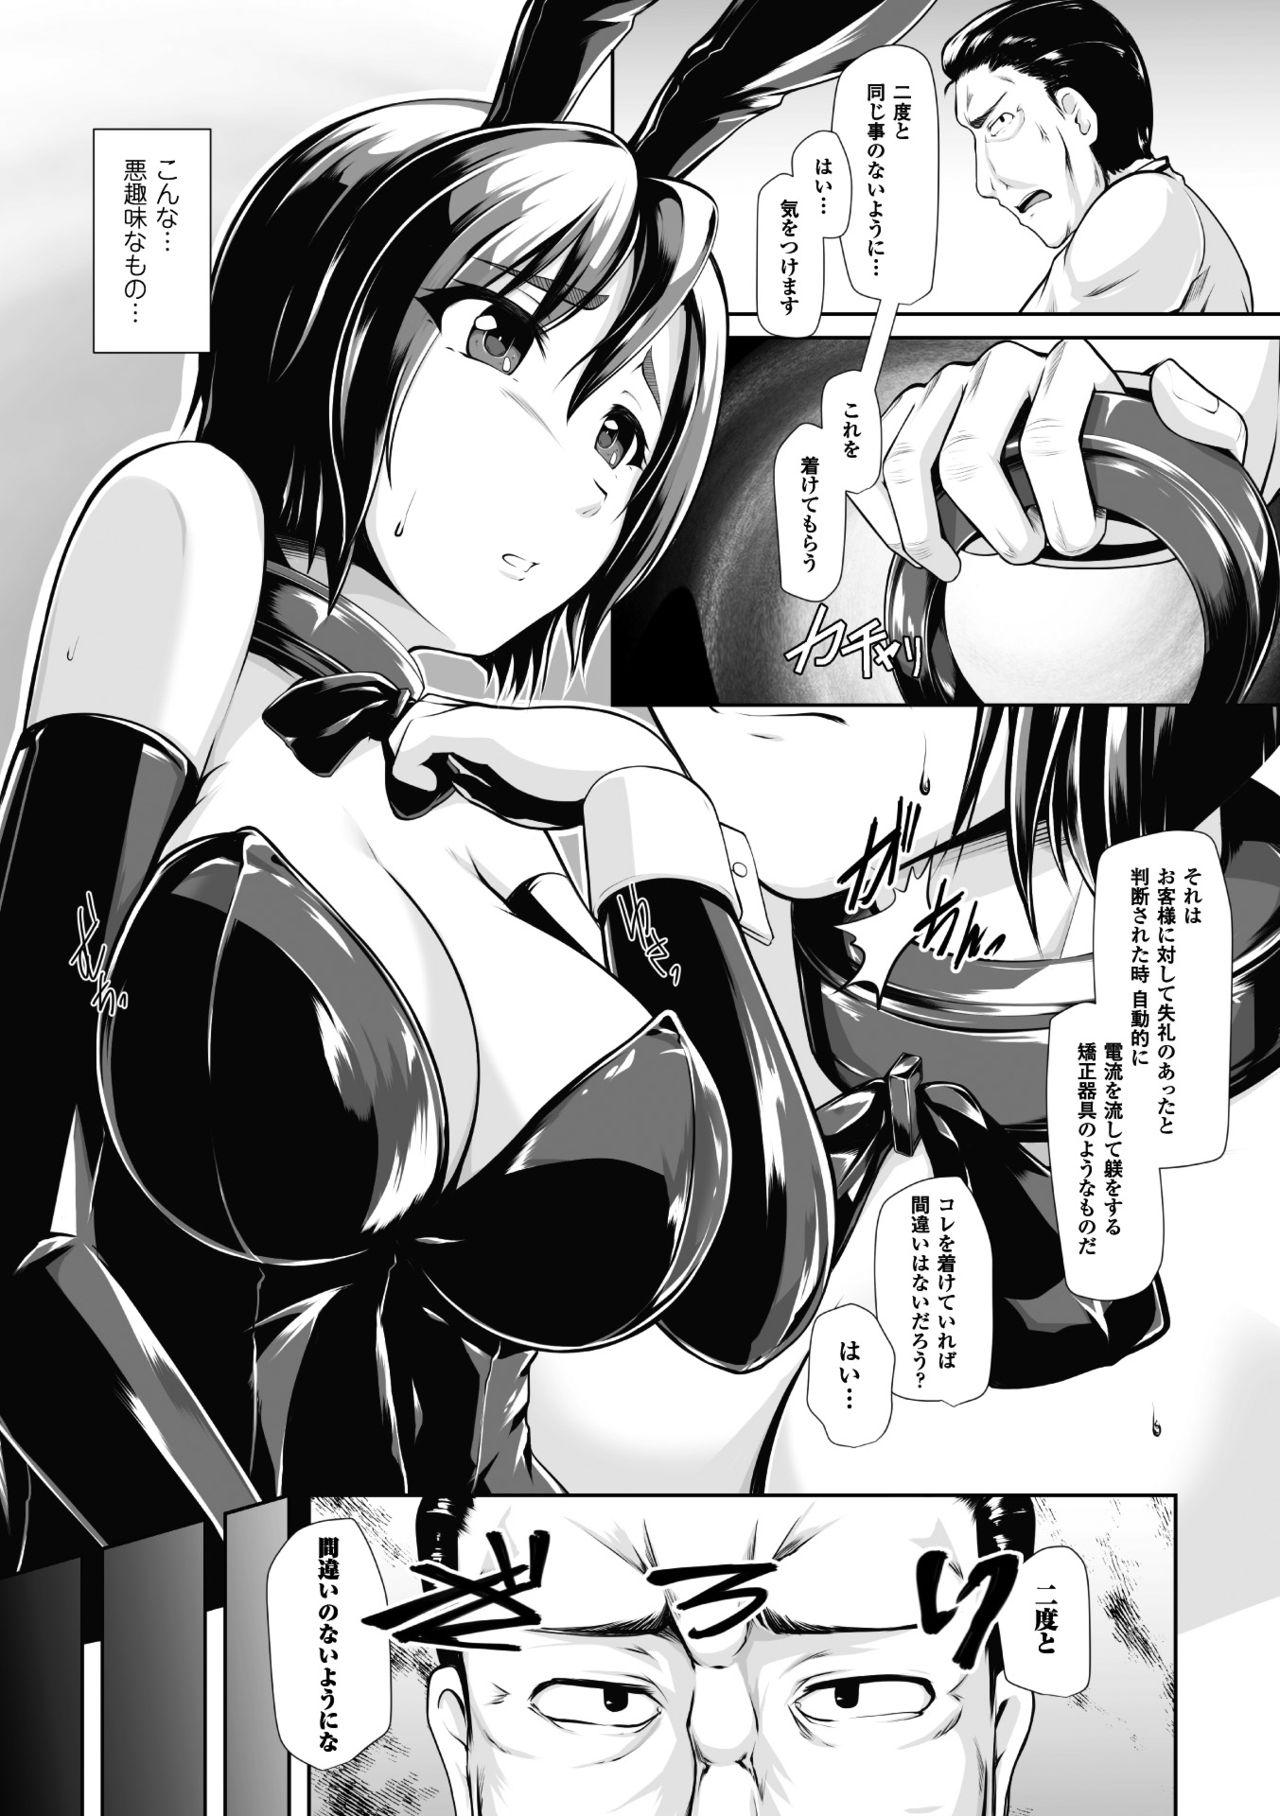 2D Comic Magazine Waki Feti Bunny Girl Vol. 1 6